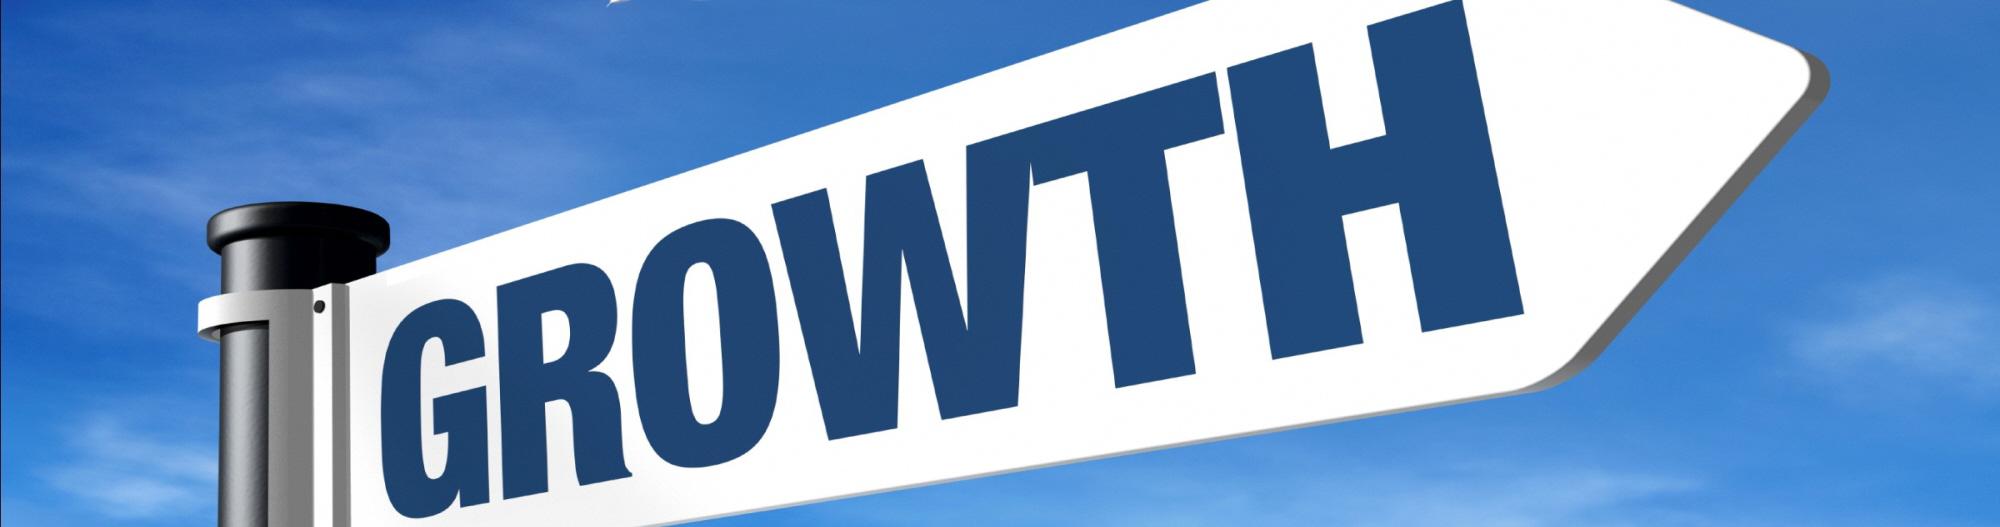 Business coaching Newbury Strategenic Momentum for business growth London